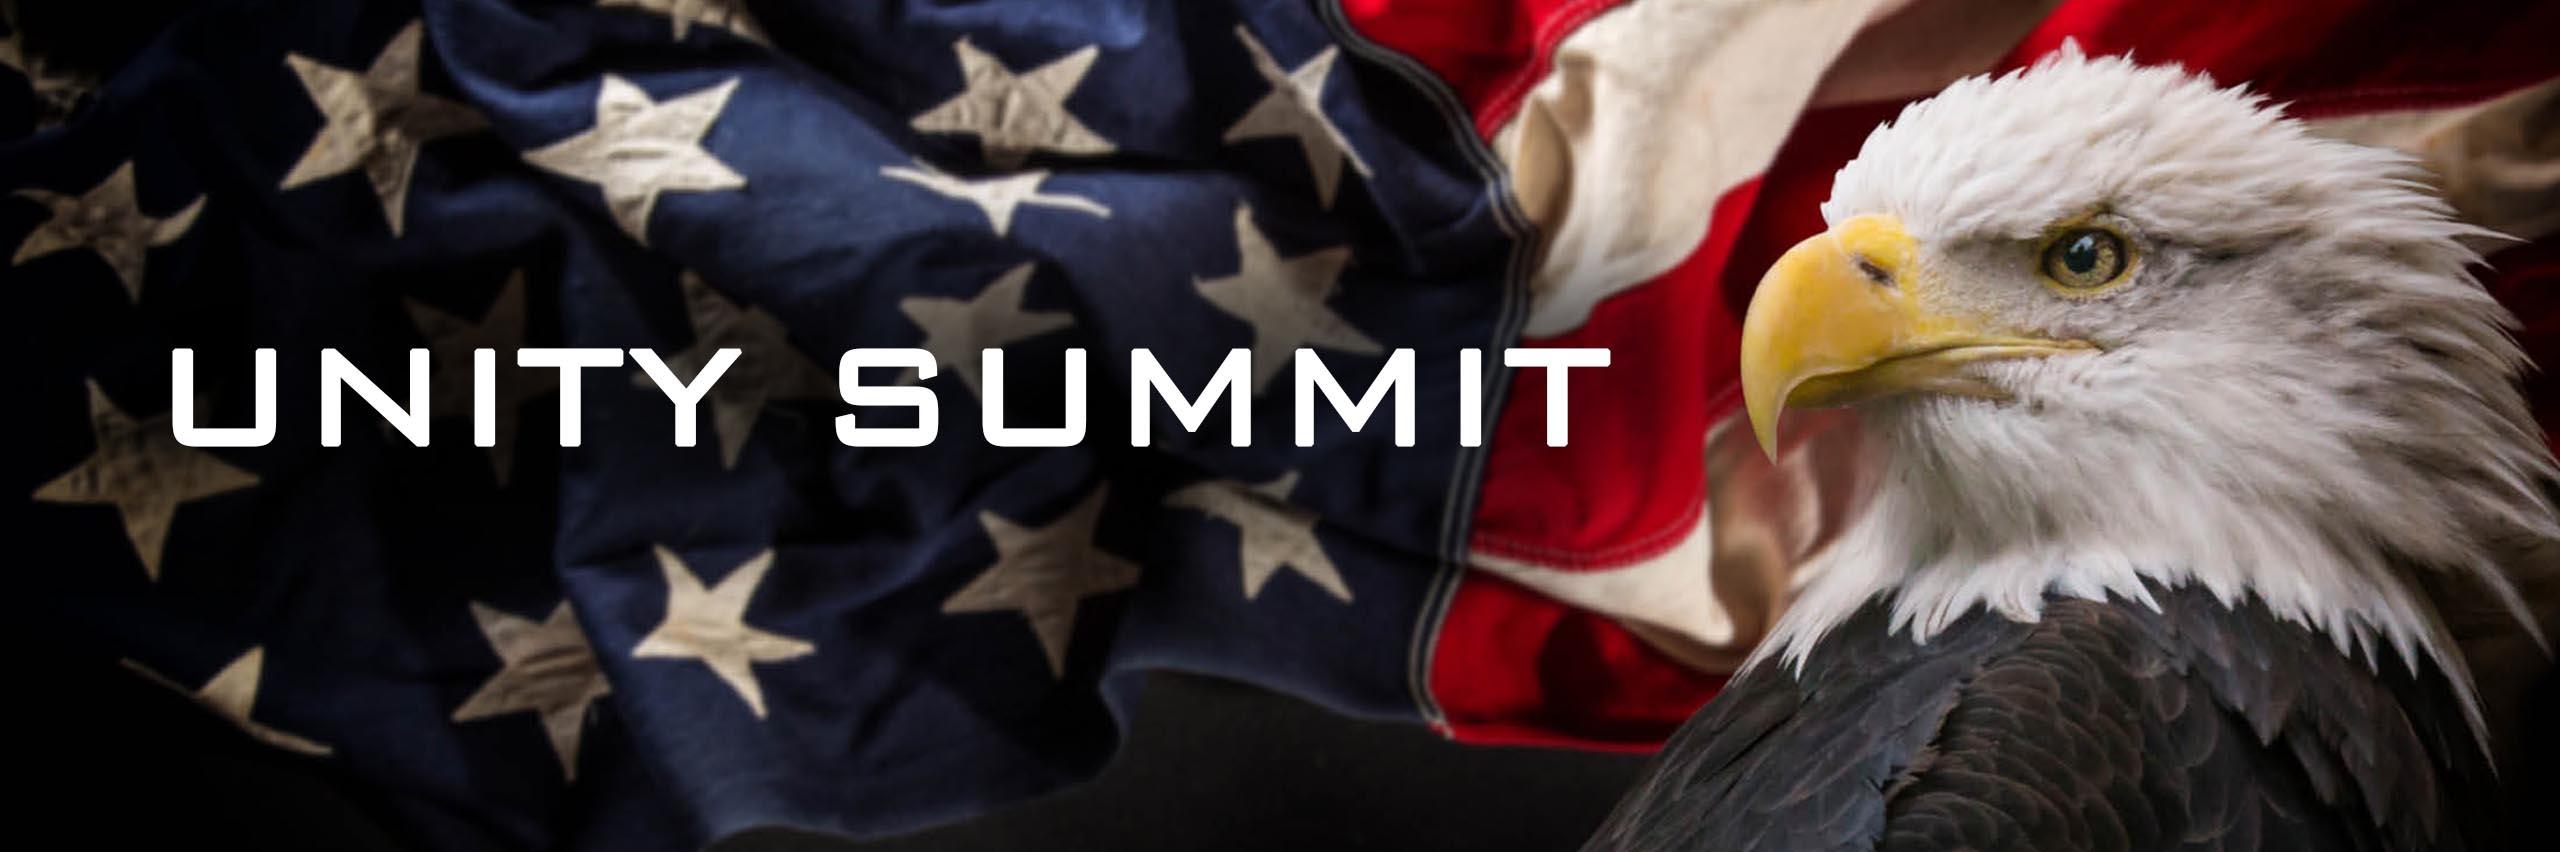 Unity_Summit-header02